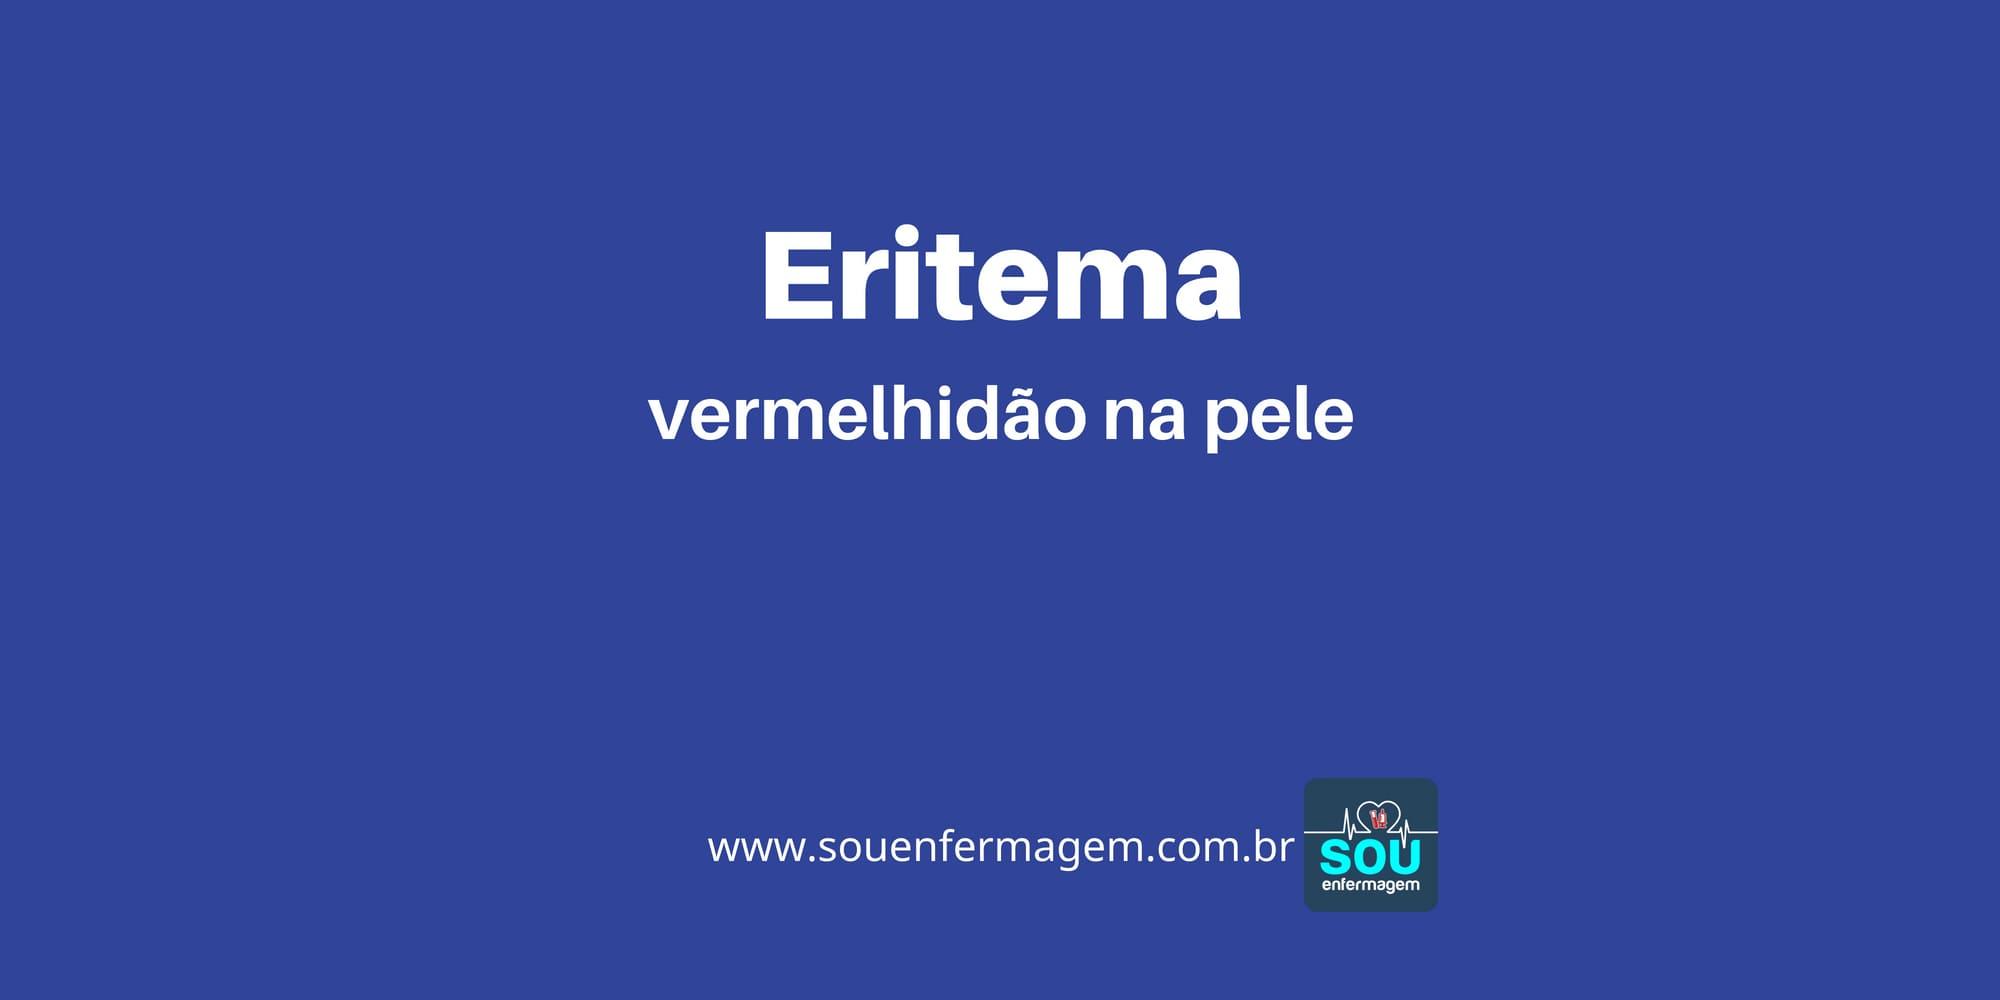 Eritema